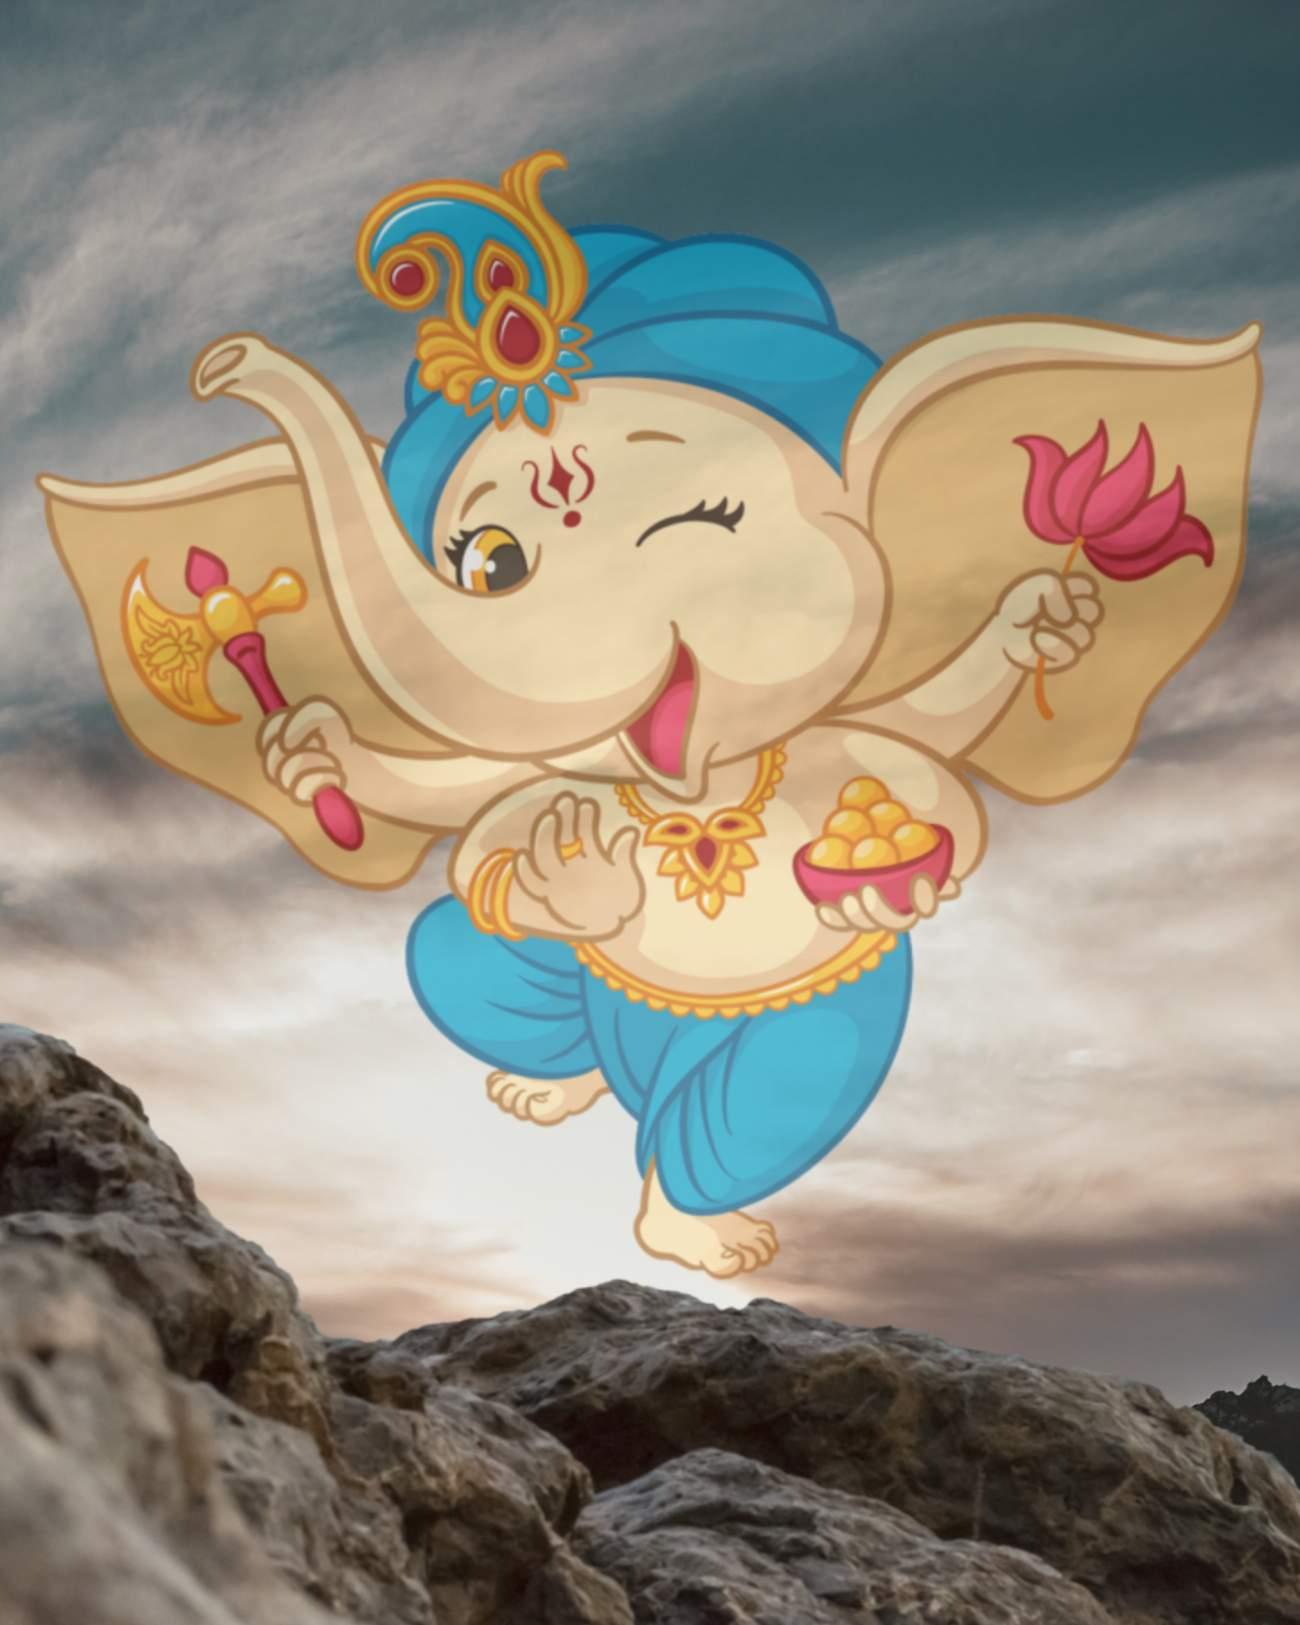 Ganesh cartoon background || bal ganesh editing background